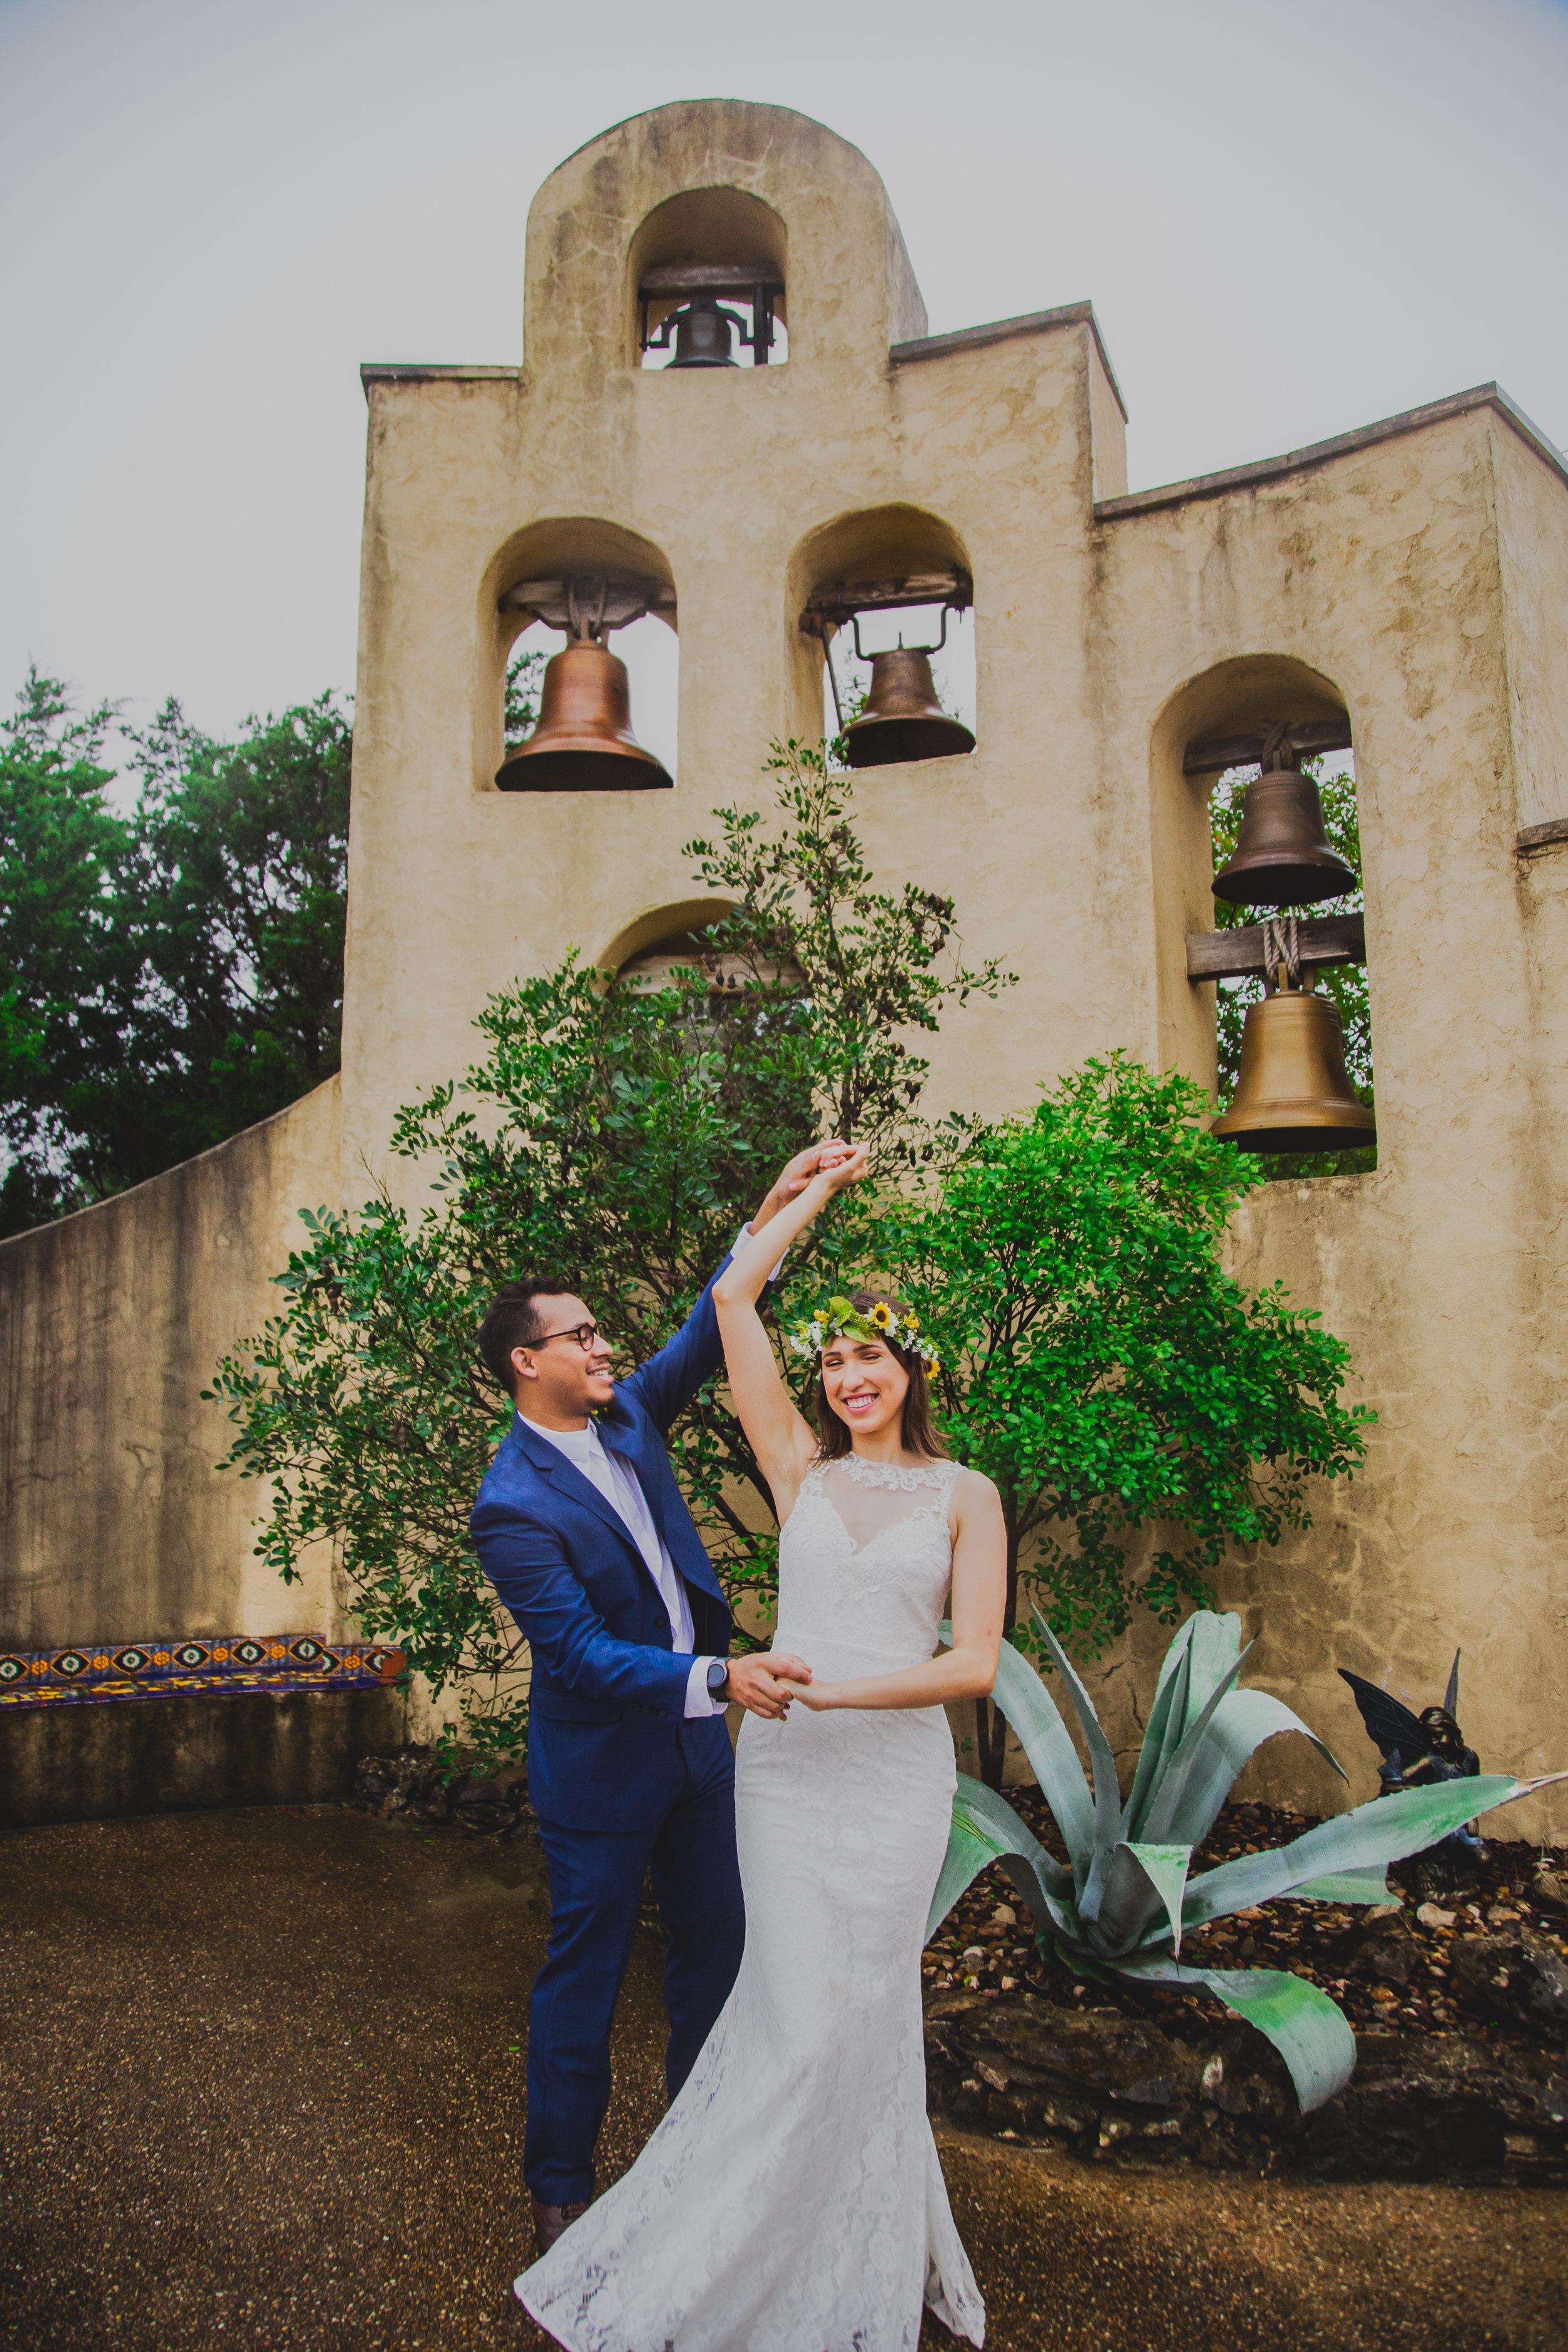 Jackie and Herbert after their wedding at Chapel Dulcinea.